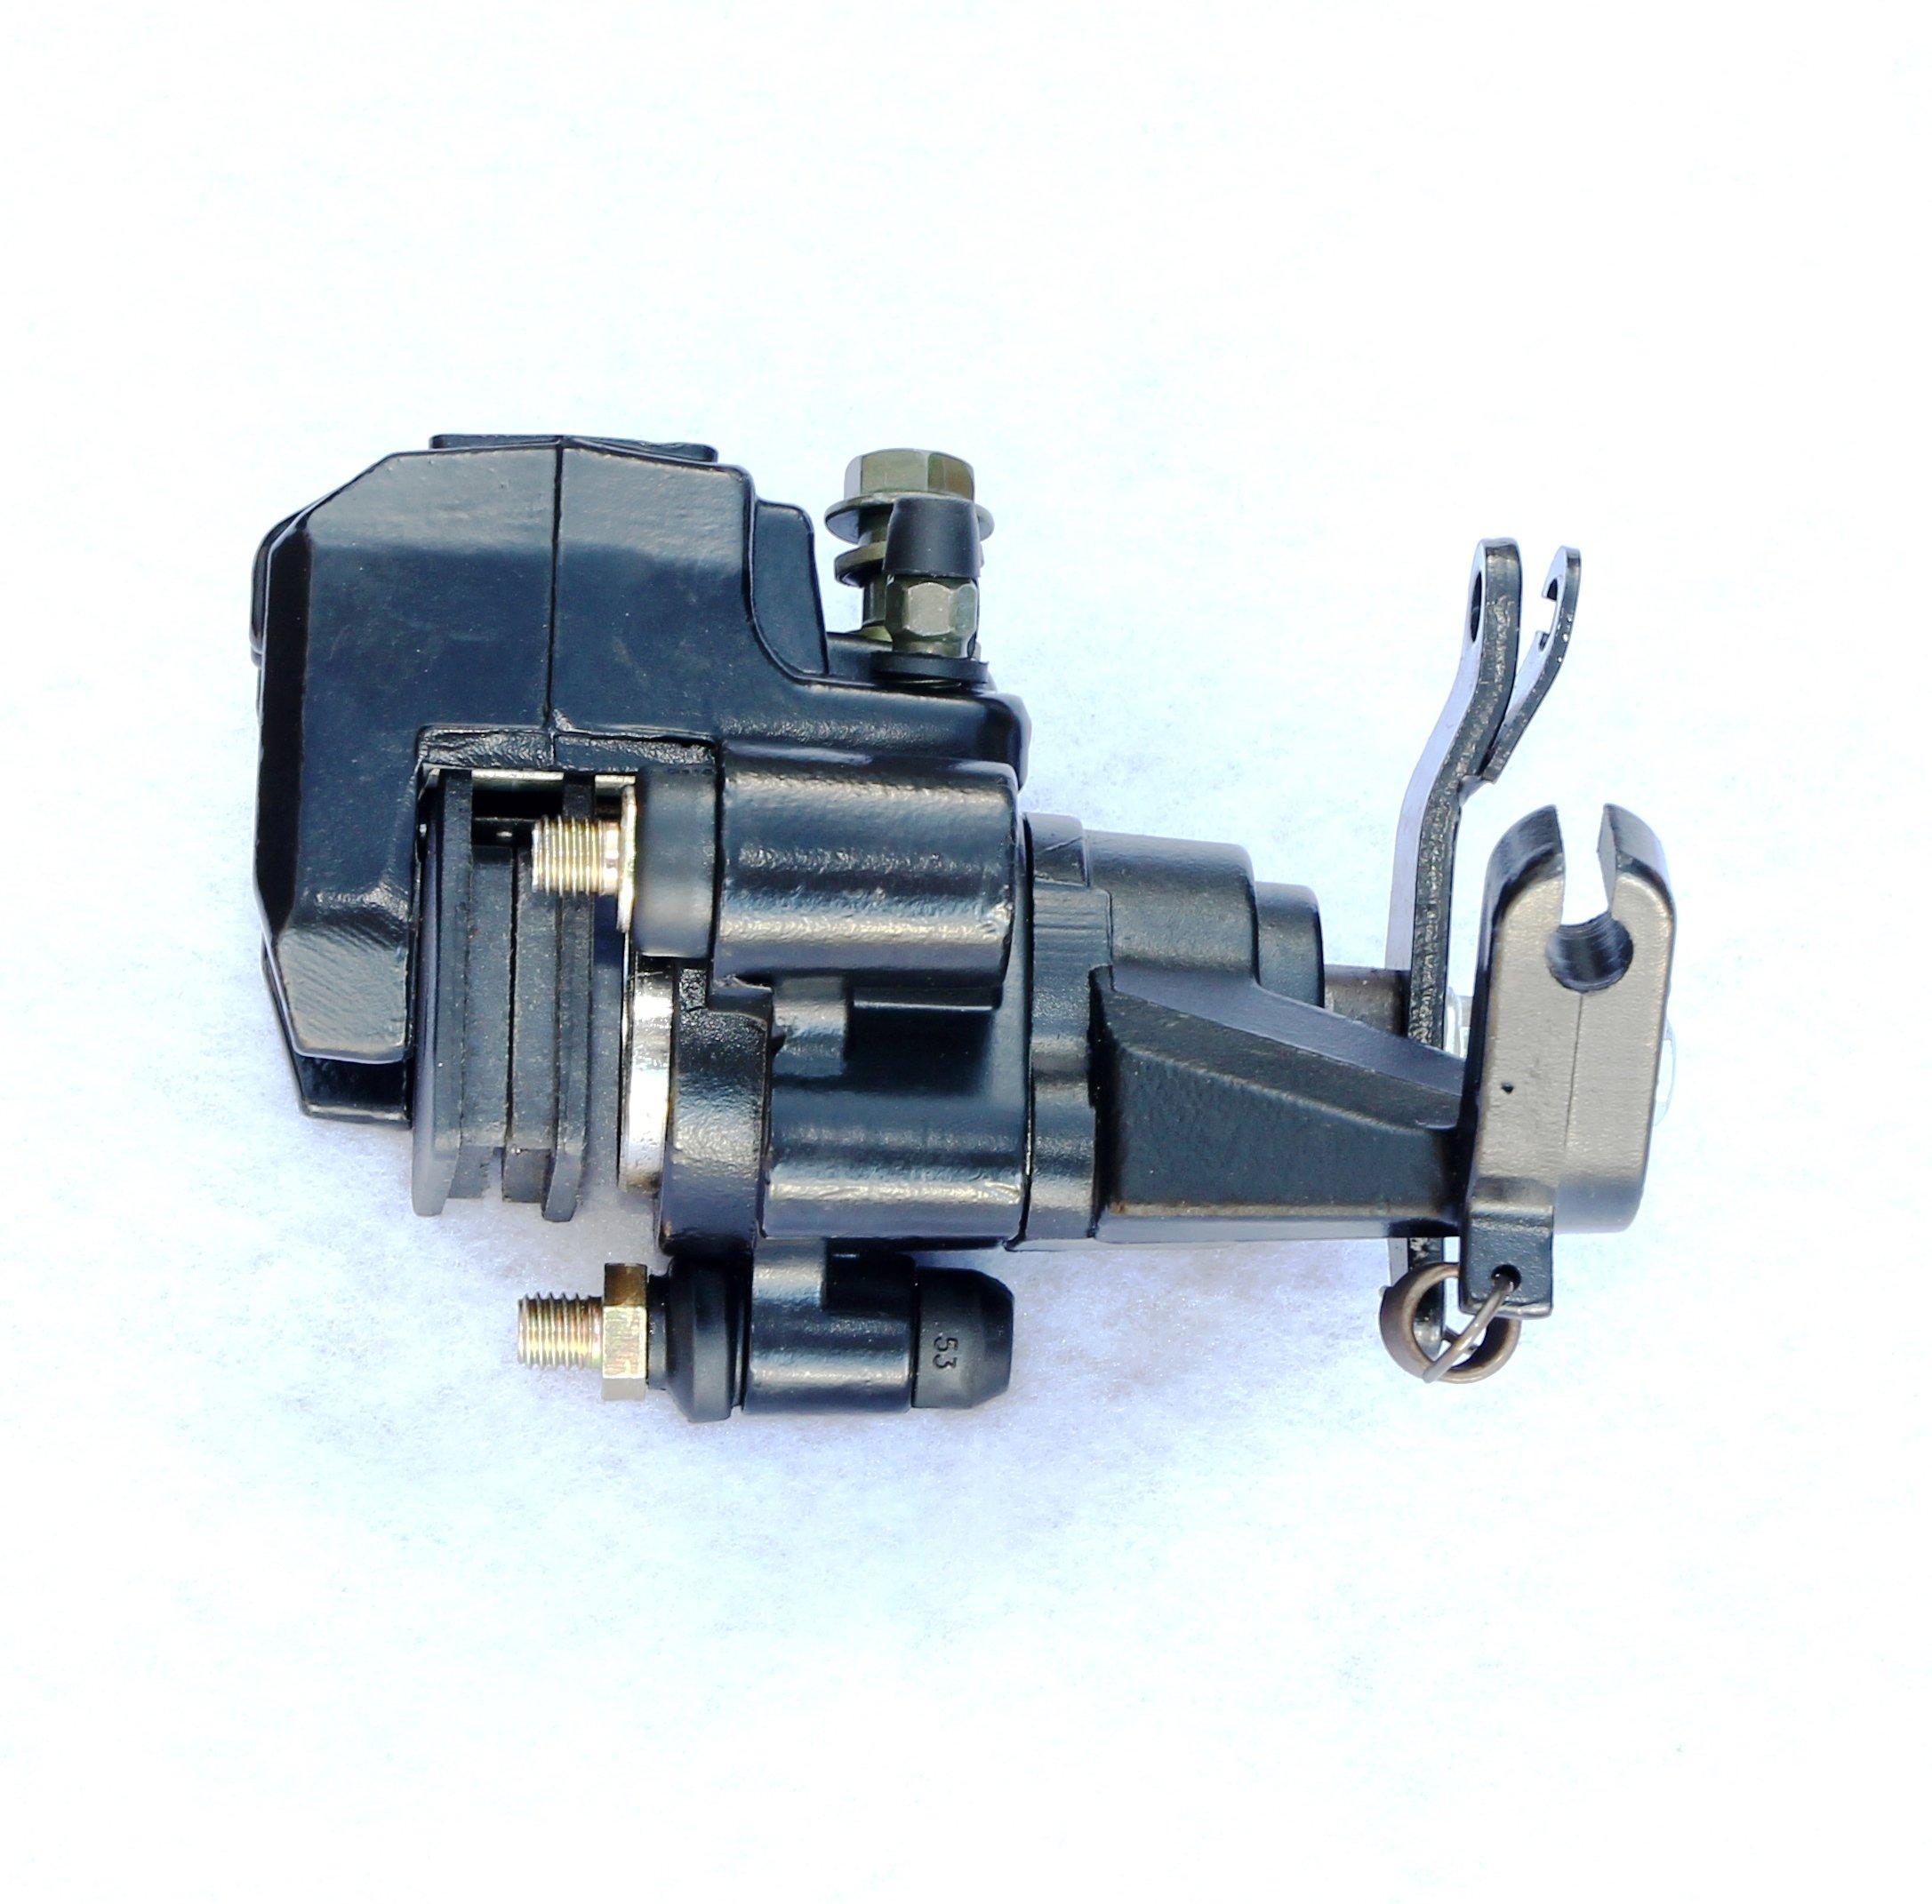 Suzuki Rear Brake Caliper for Quadrunner Quadsport Quadracer - Direct OE Replacement